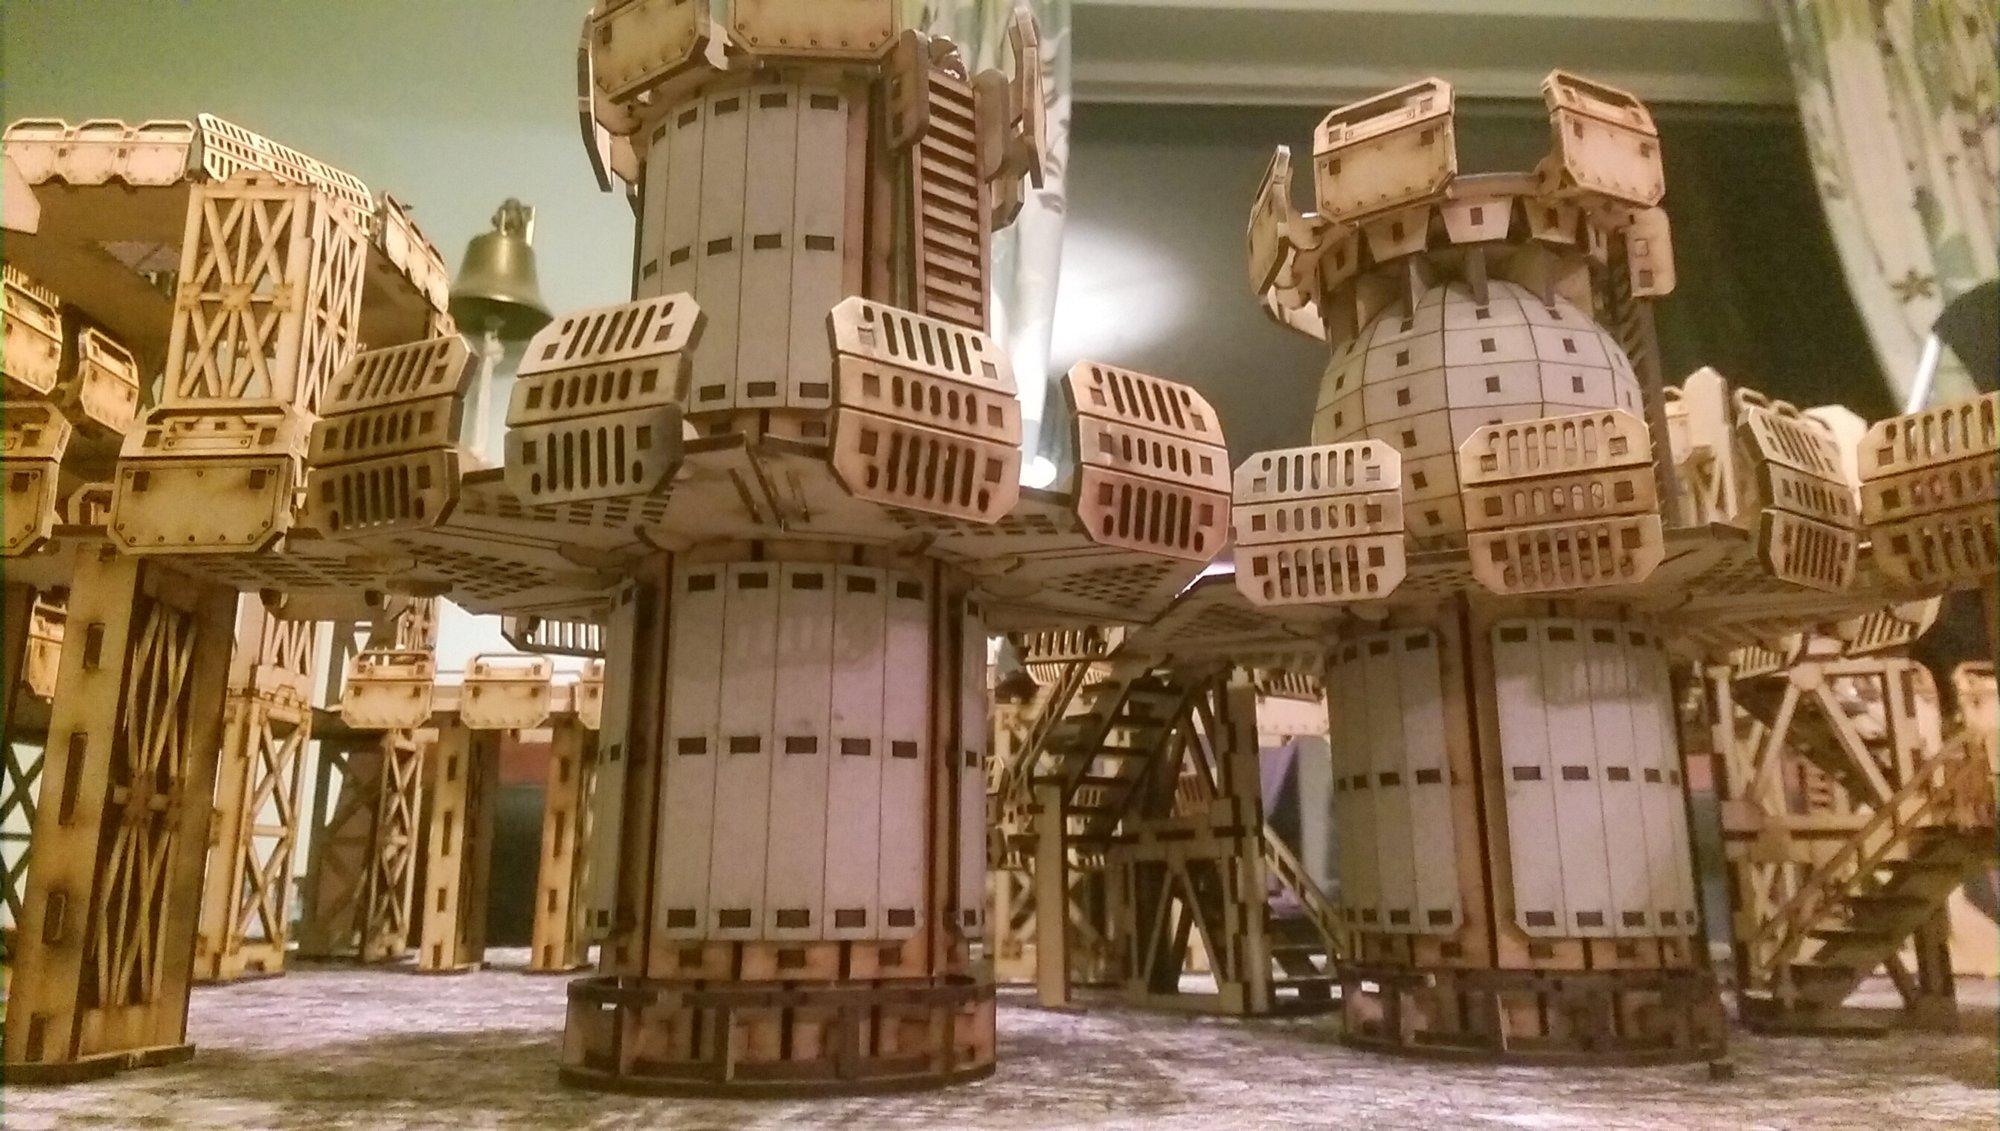 Necromunda - TT Combat Hive terrain | YakTribe games